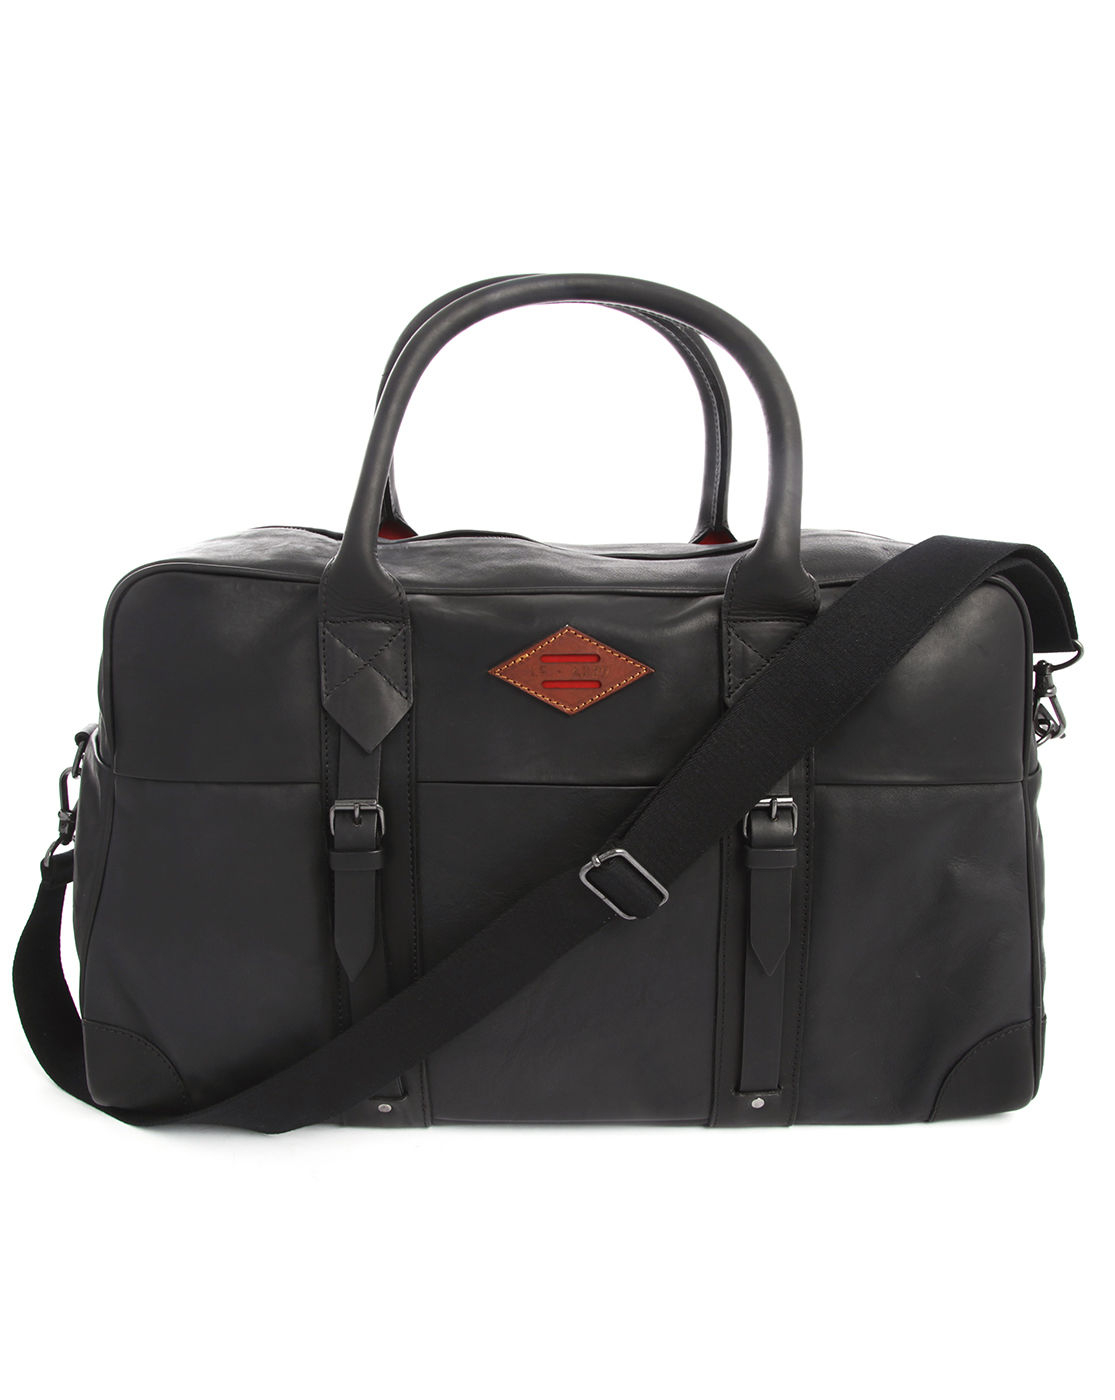 Leon flam 48H Bag, Black Leather in Black for Men | Lyst